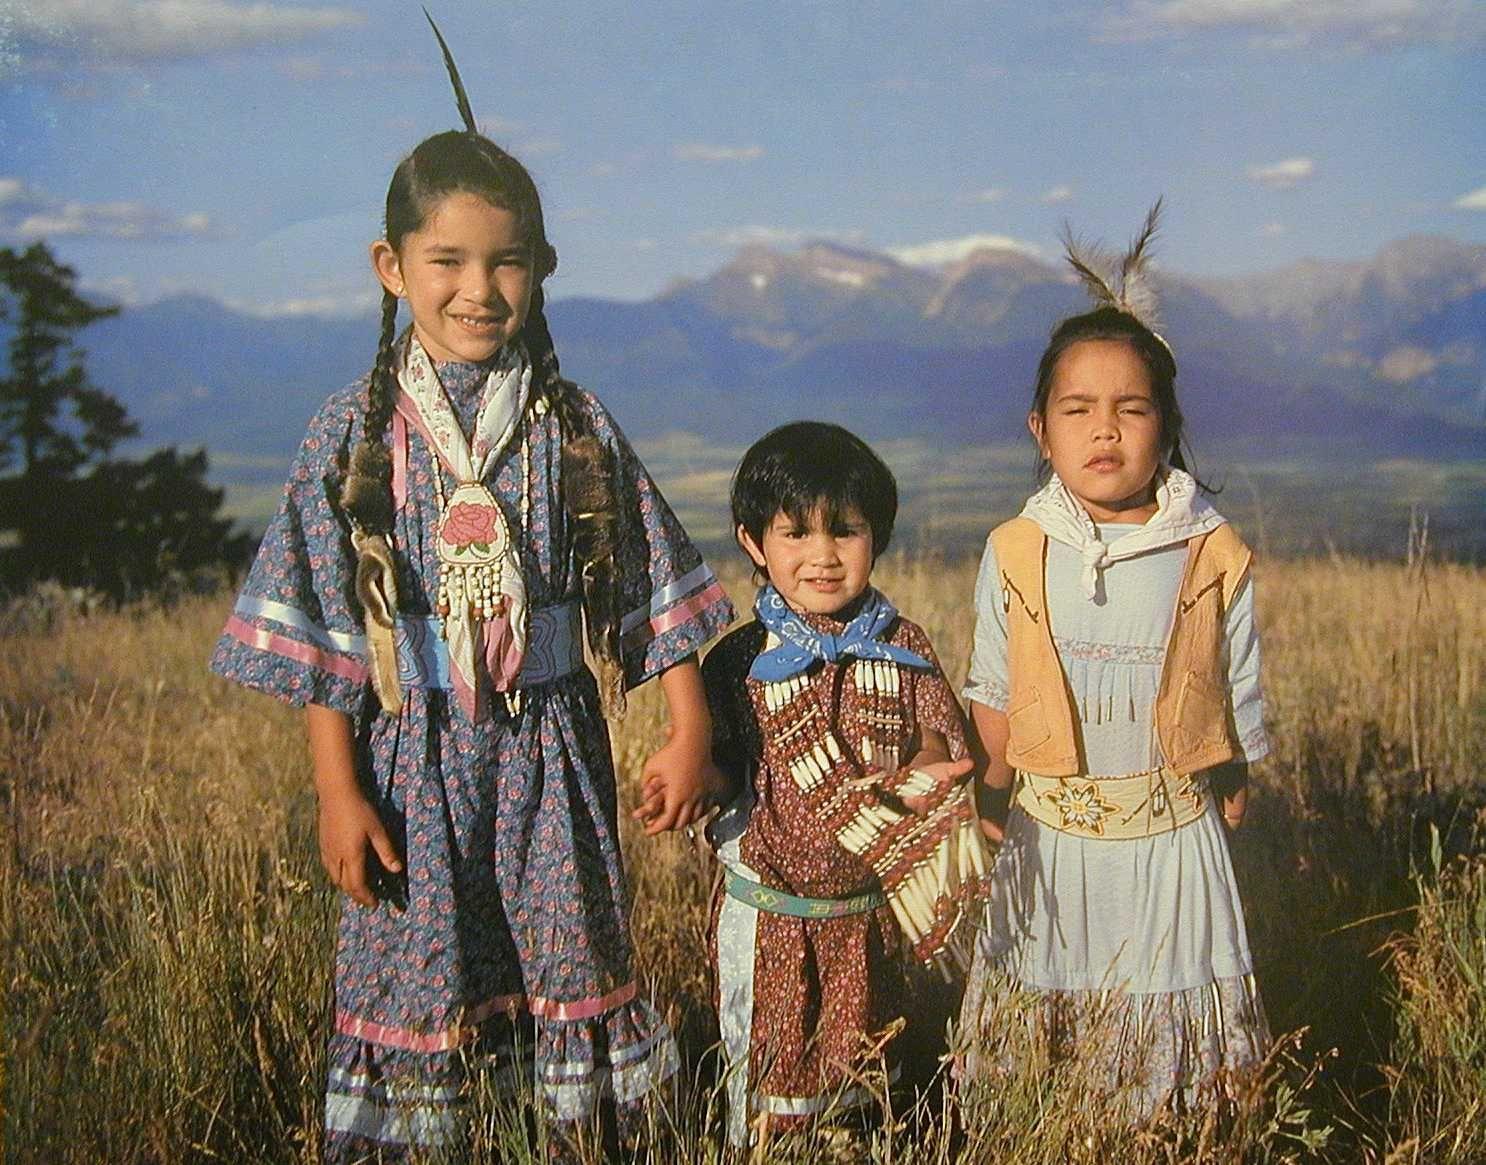 native american tribe Navaho, hopi, zuni, apache, choctaw, creek, osage, potawatomie, blackfoot,  crow, sioux/lakota, chippewa/ojibwe, seminole, mohawk, huron, mohegan,.